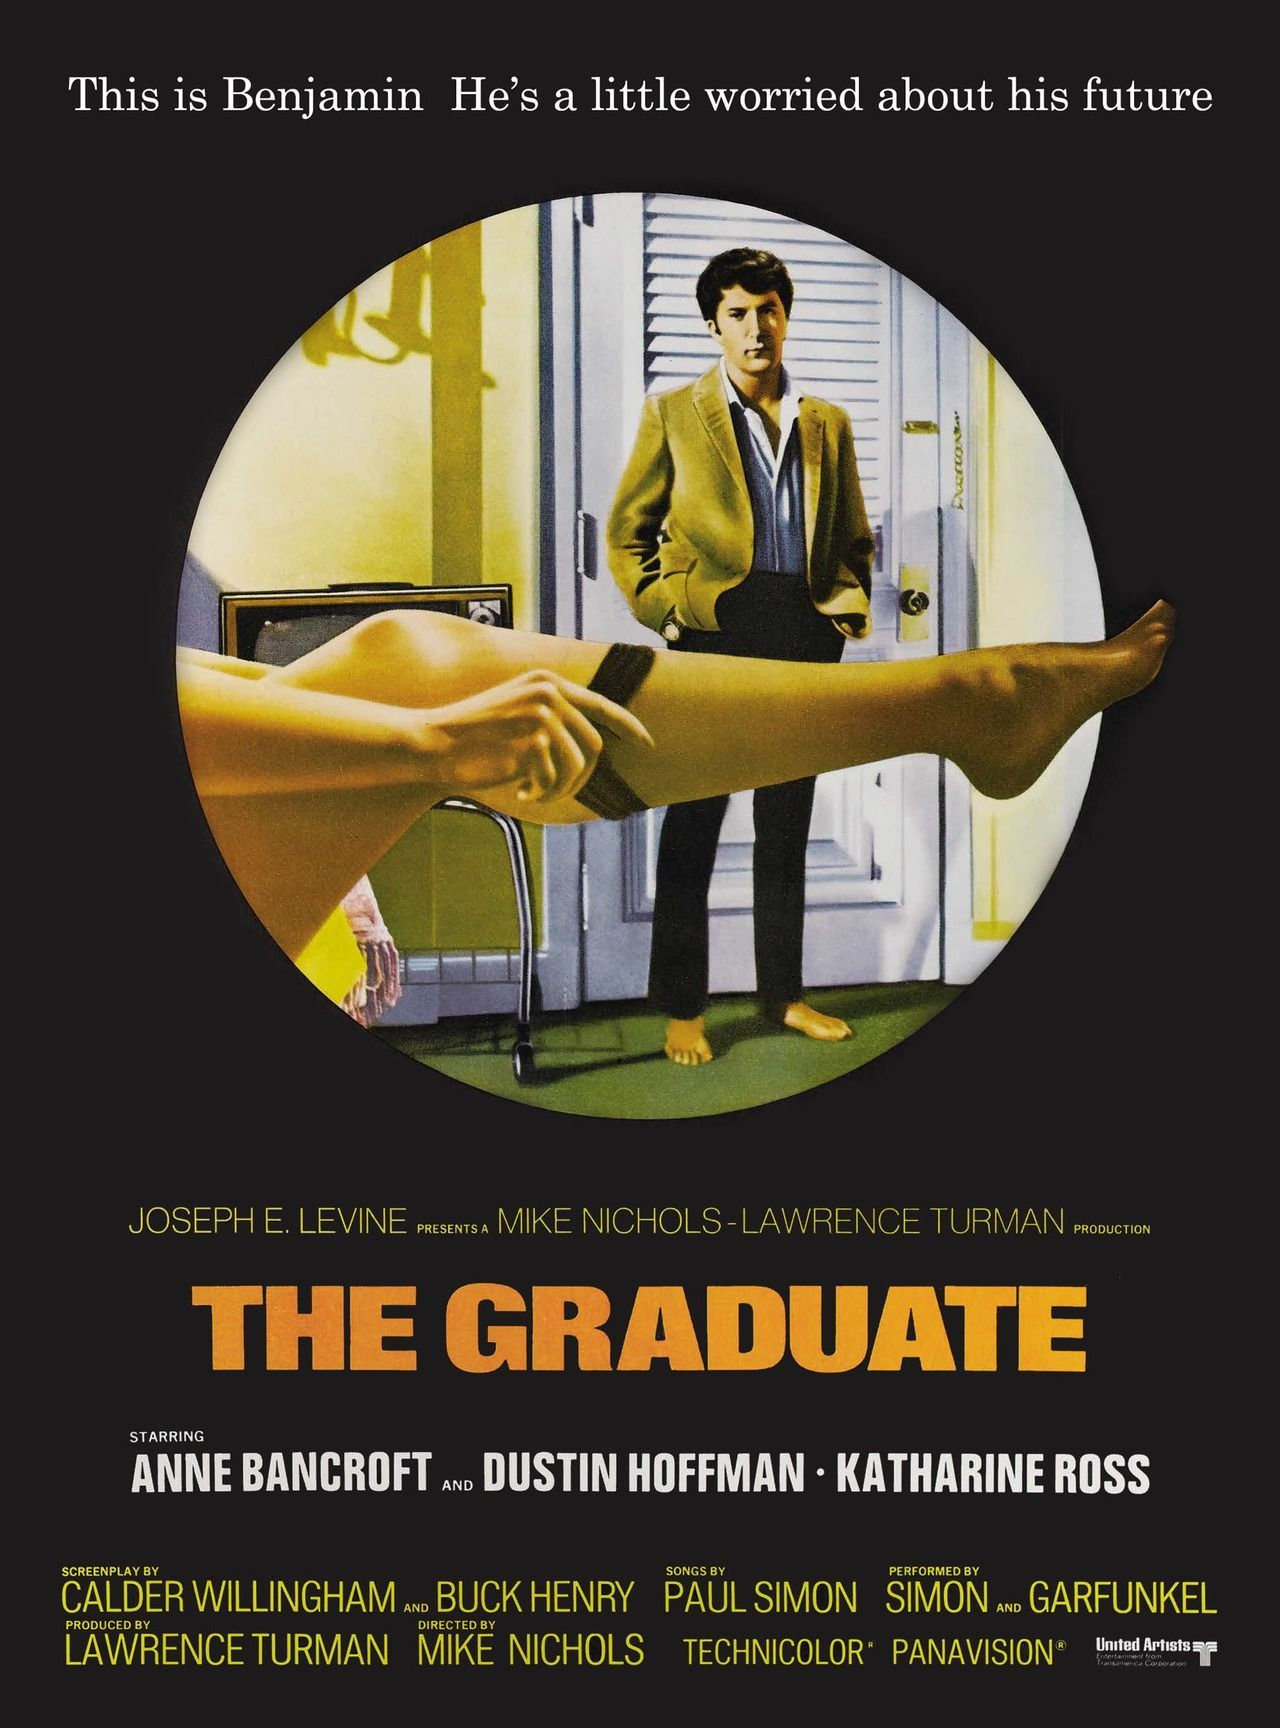 The GraduateLARGE 24X36 MOVIE POSTER Premium Poster Paper